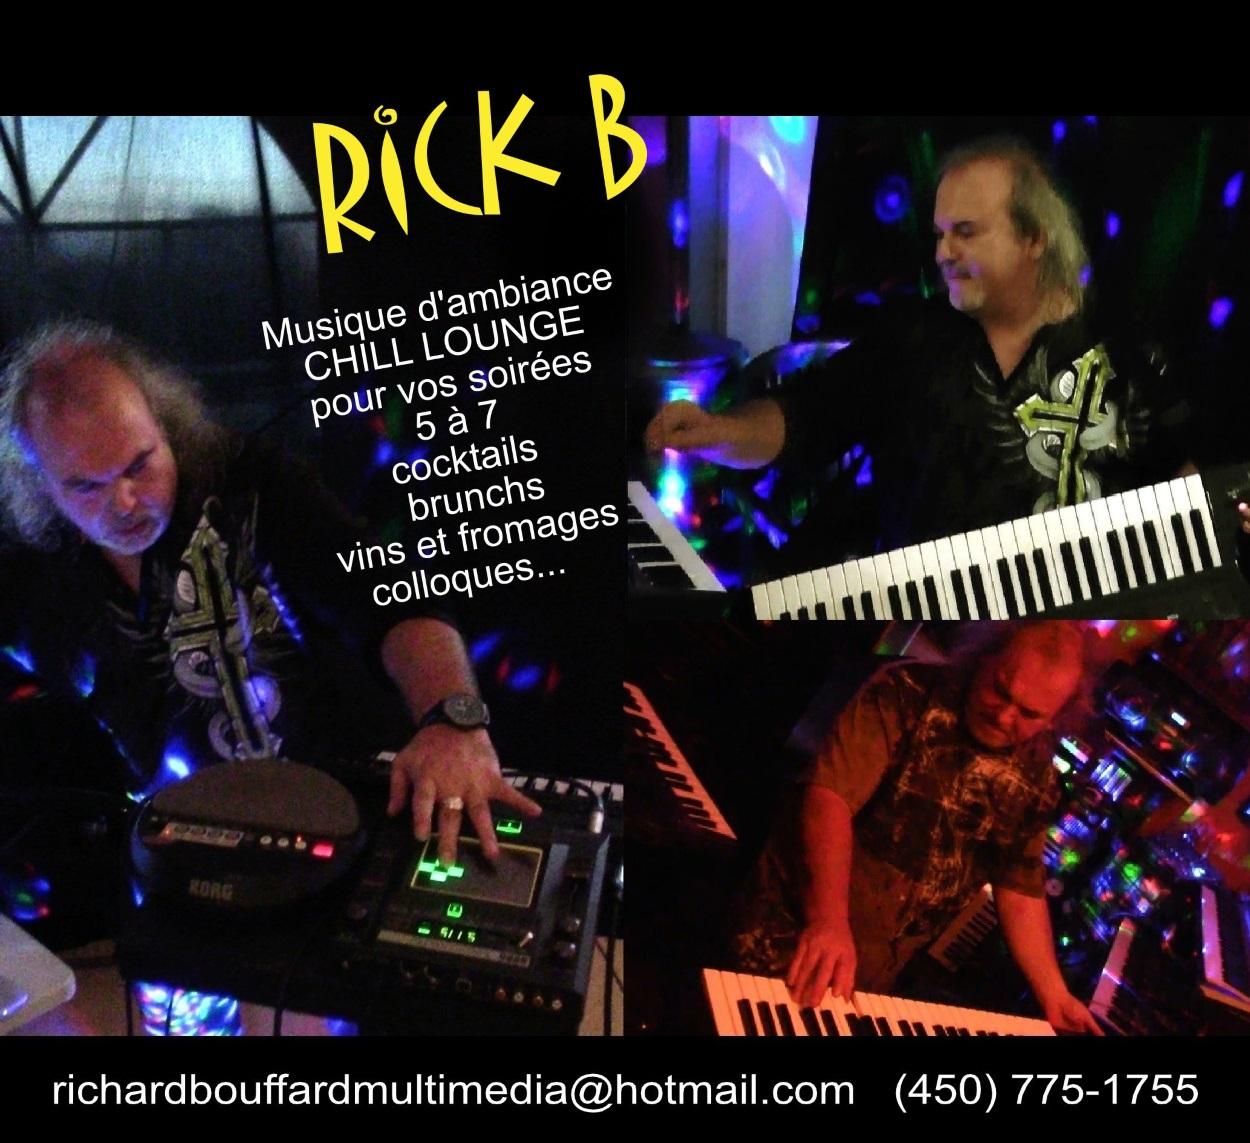 Rick B